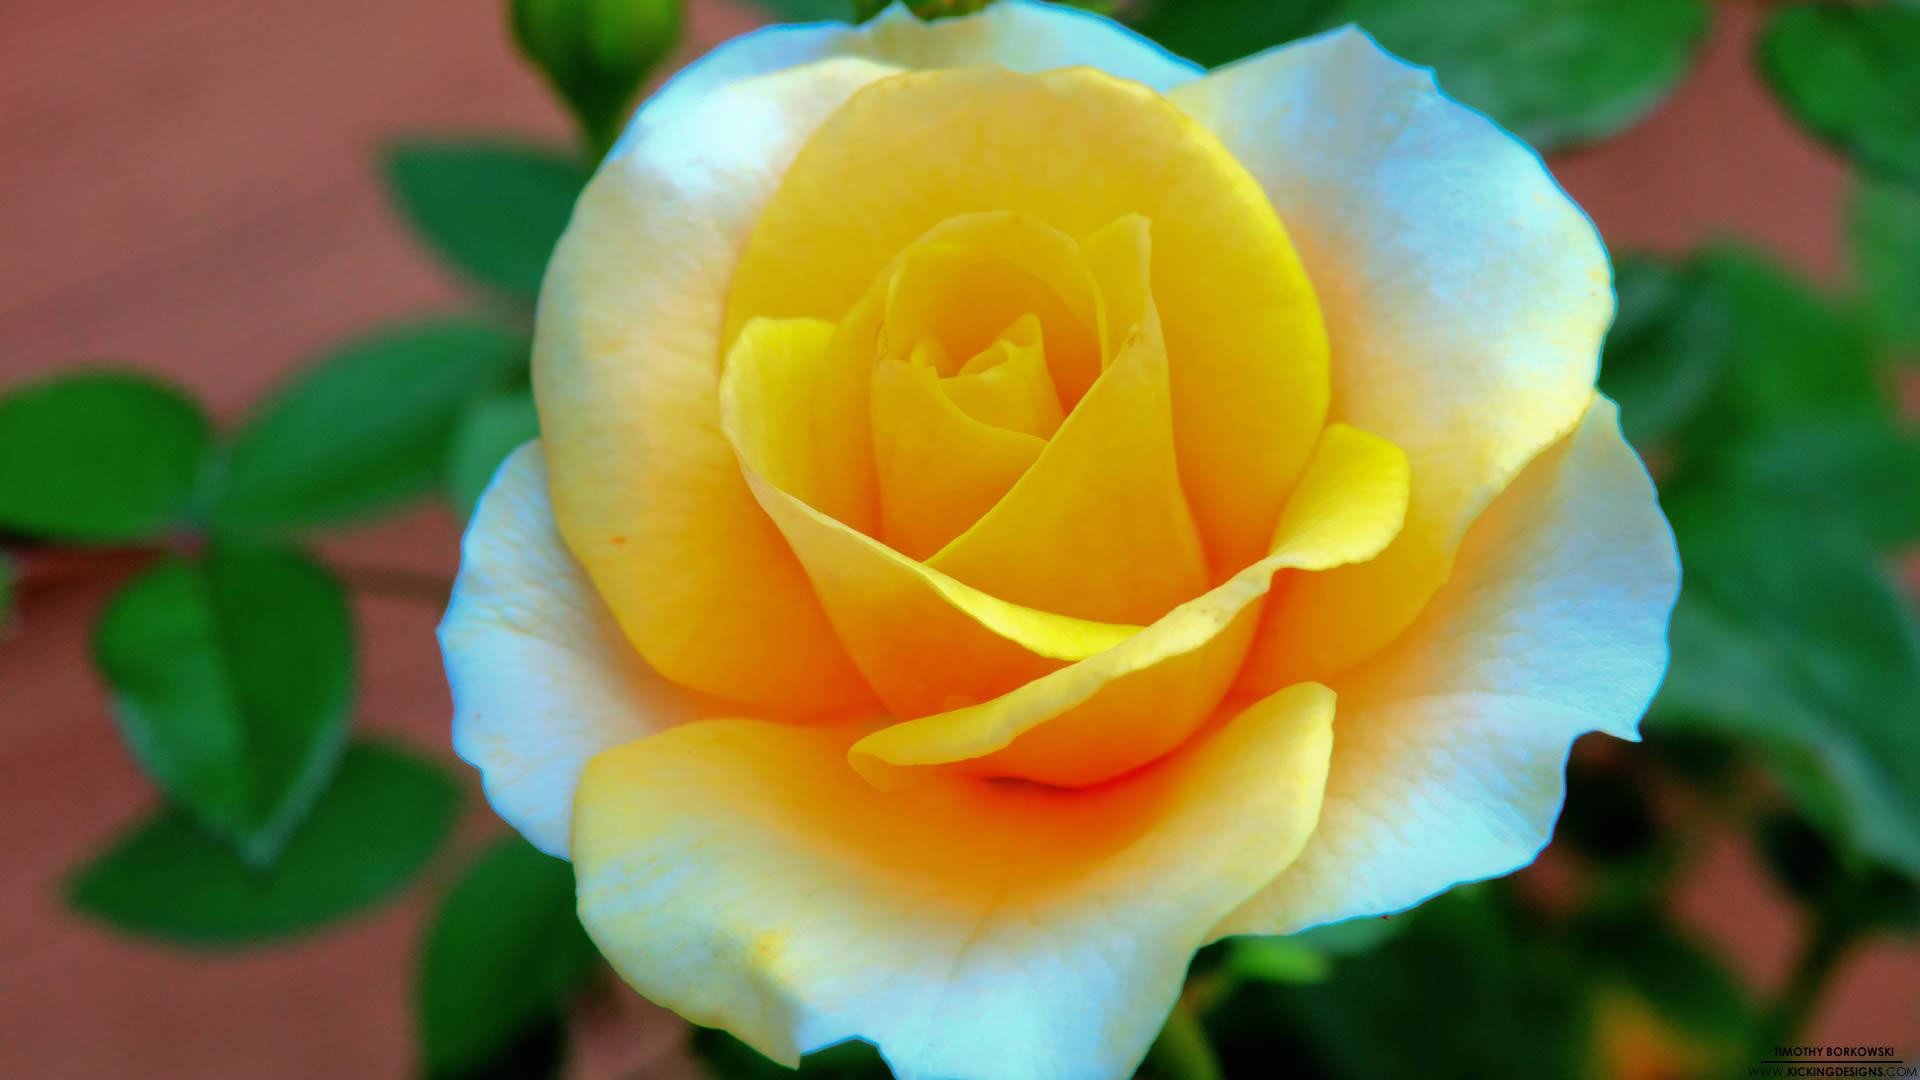 Hd flower wallpapers 1080p wallpapersafari - Rose flower images full size hd ...